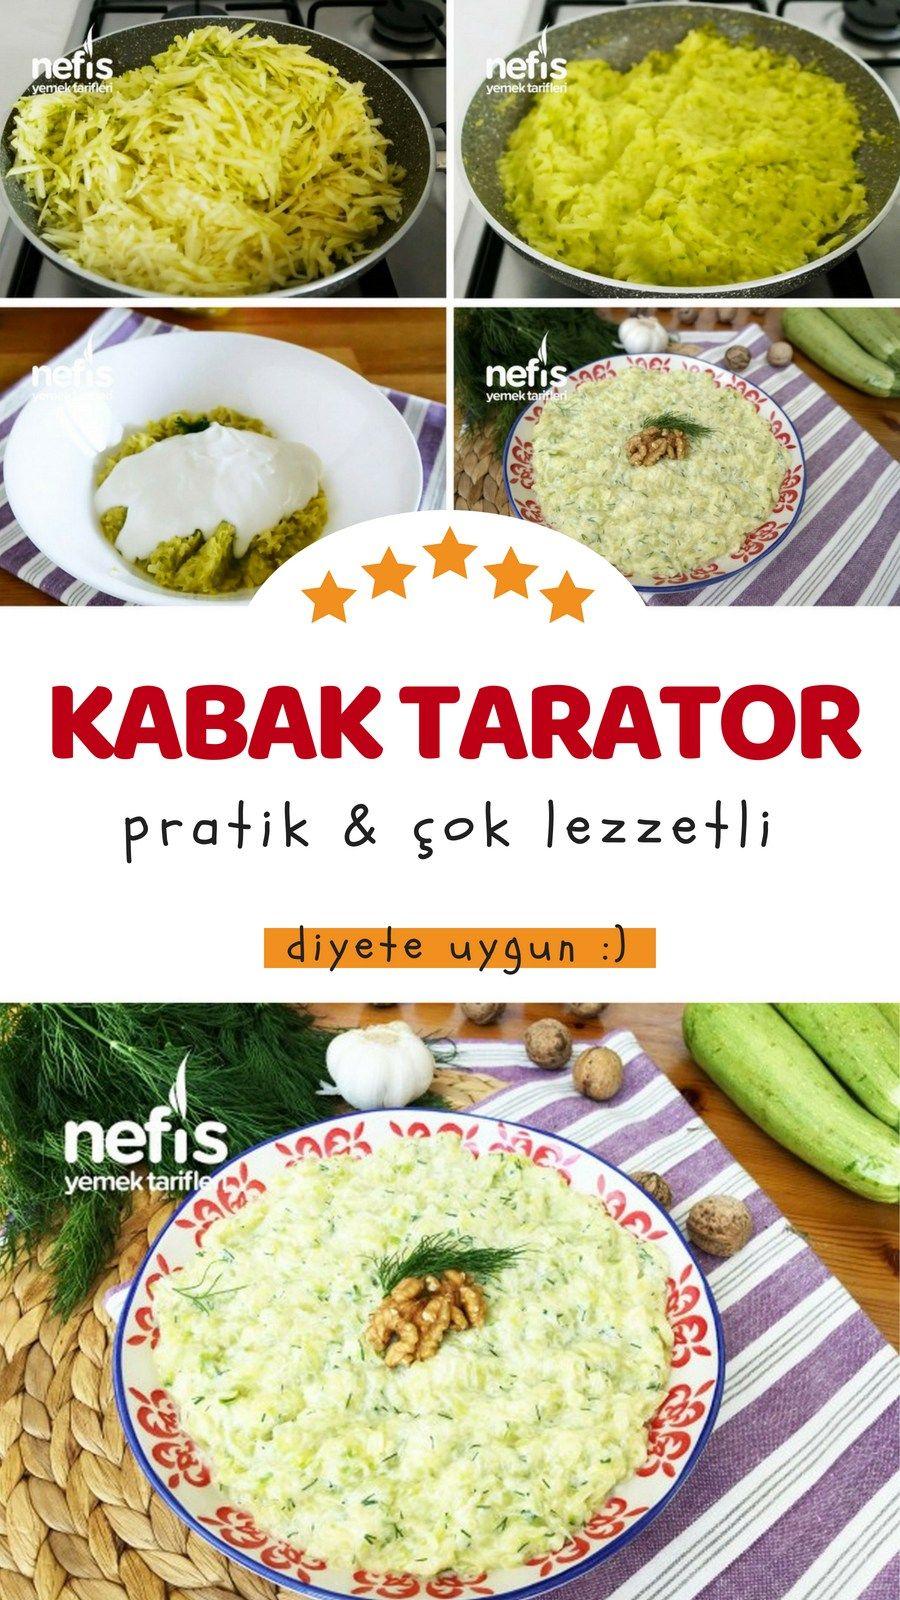 Kabak Tarator